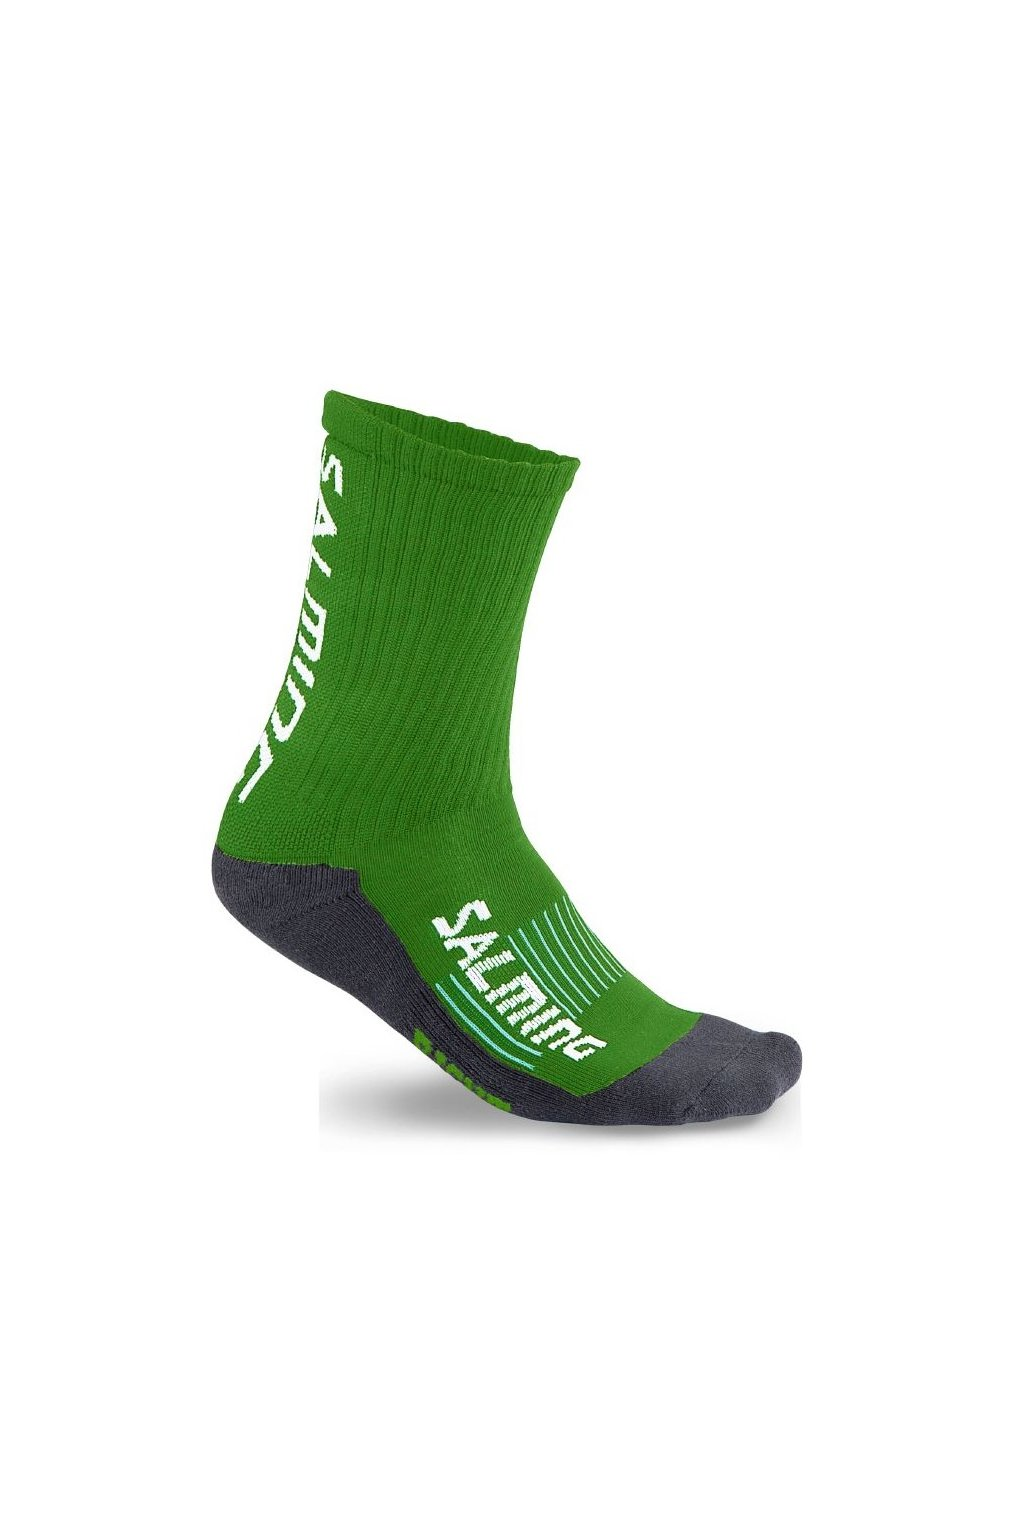 salming advanced indoor sock (3)